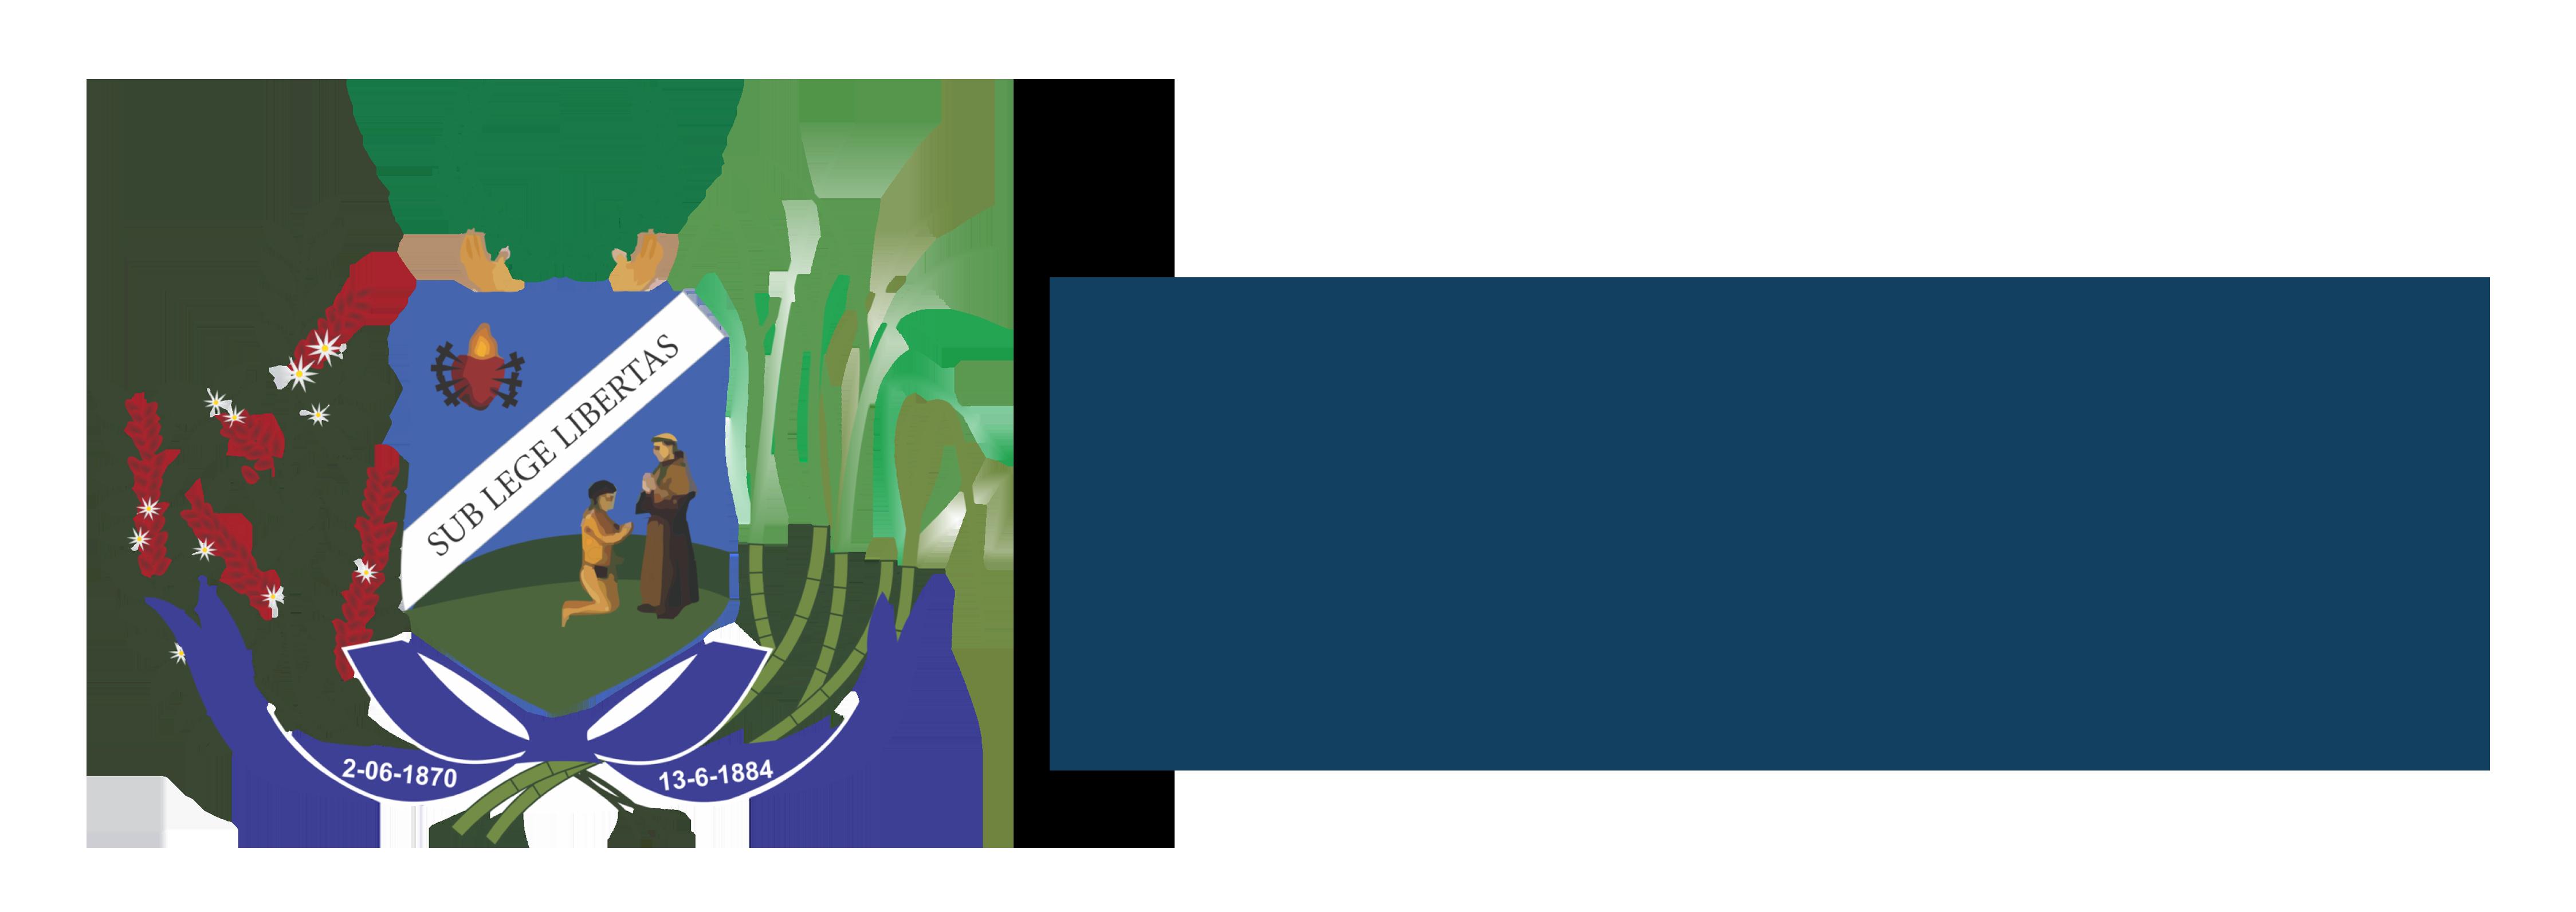 Prefeitura Municipal de Triunfo